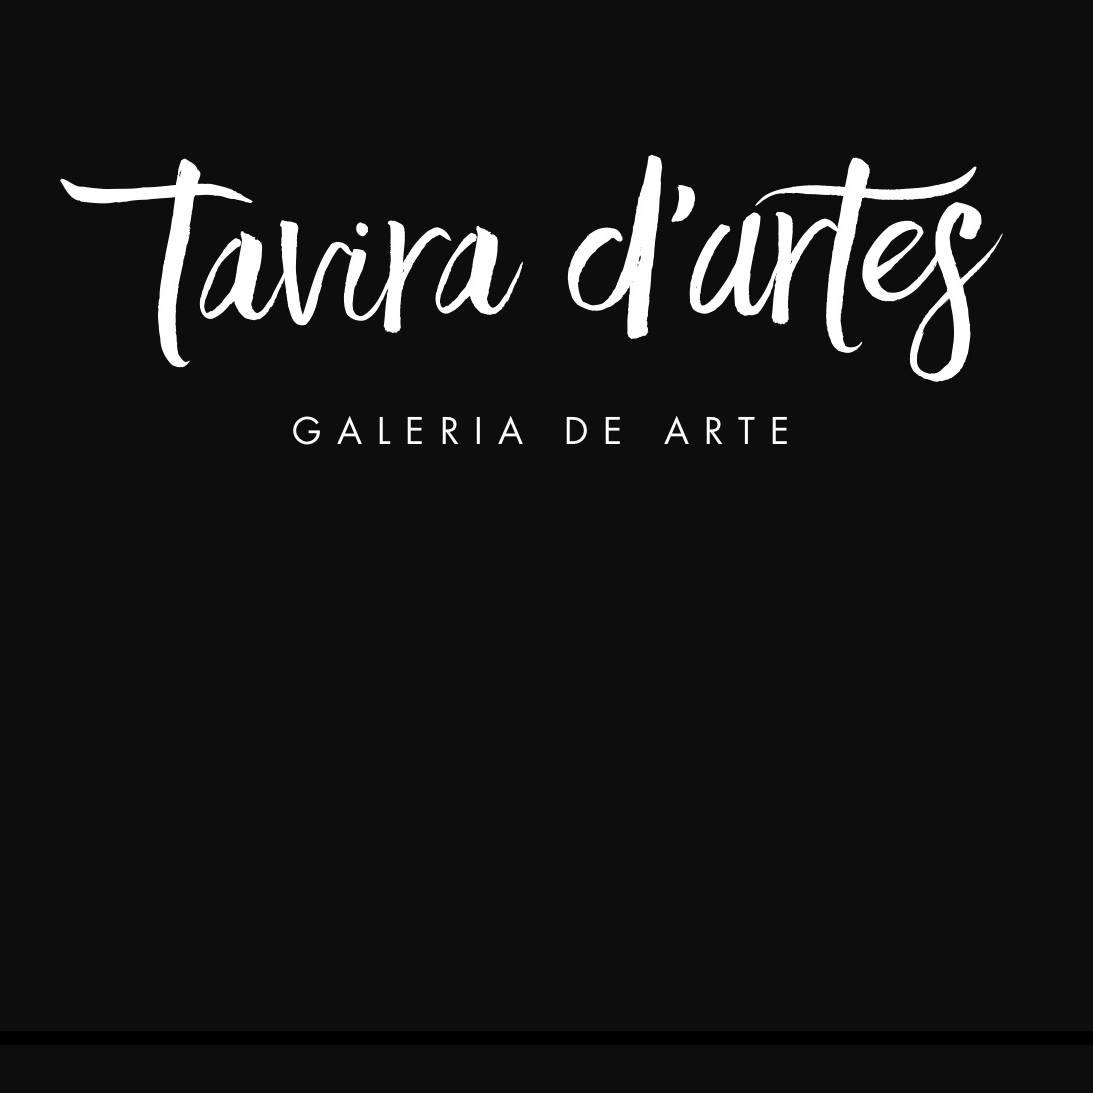 Tavira D'Artes